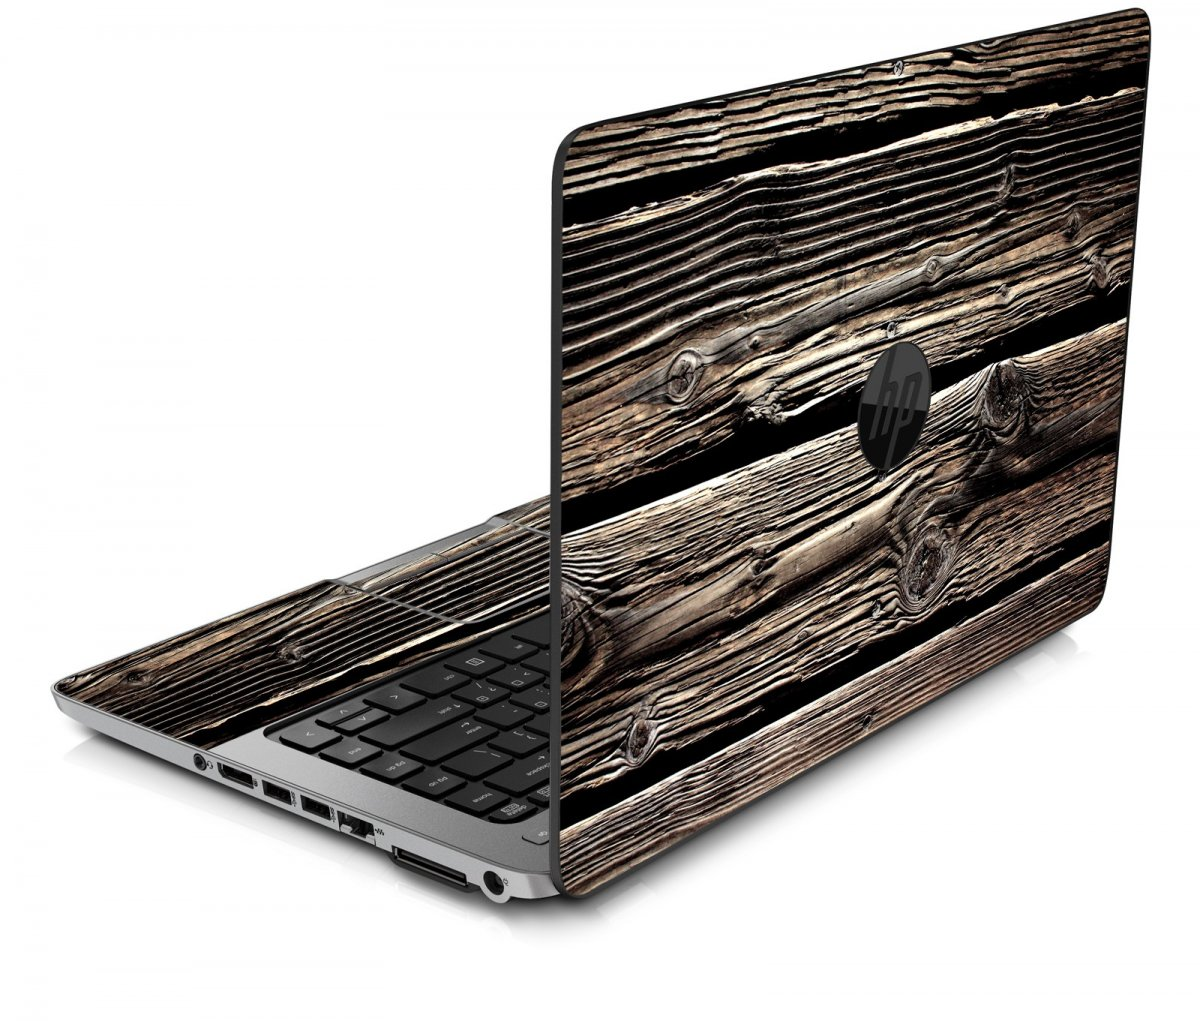 WOOD HP ProBook 450 G1 G2 G3 Skin